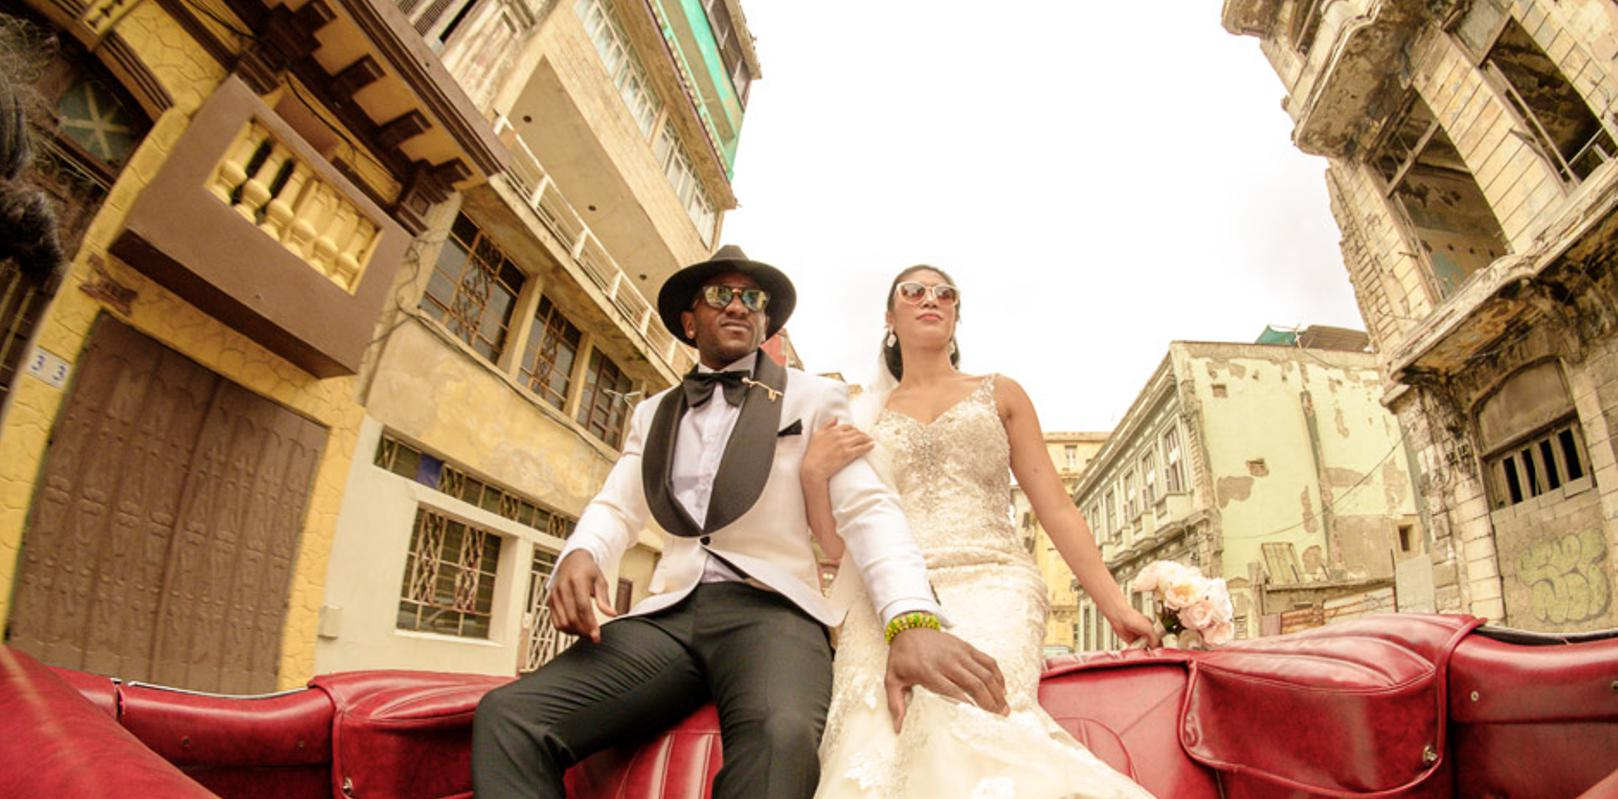 bodas-sin-clasificar-sin-tema-cuba-41112.jpg